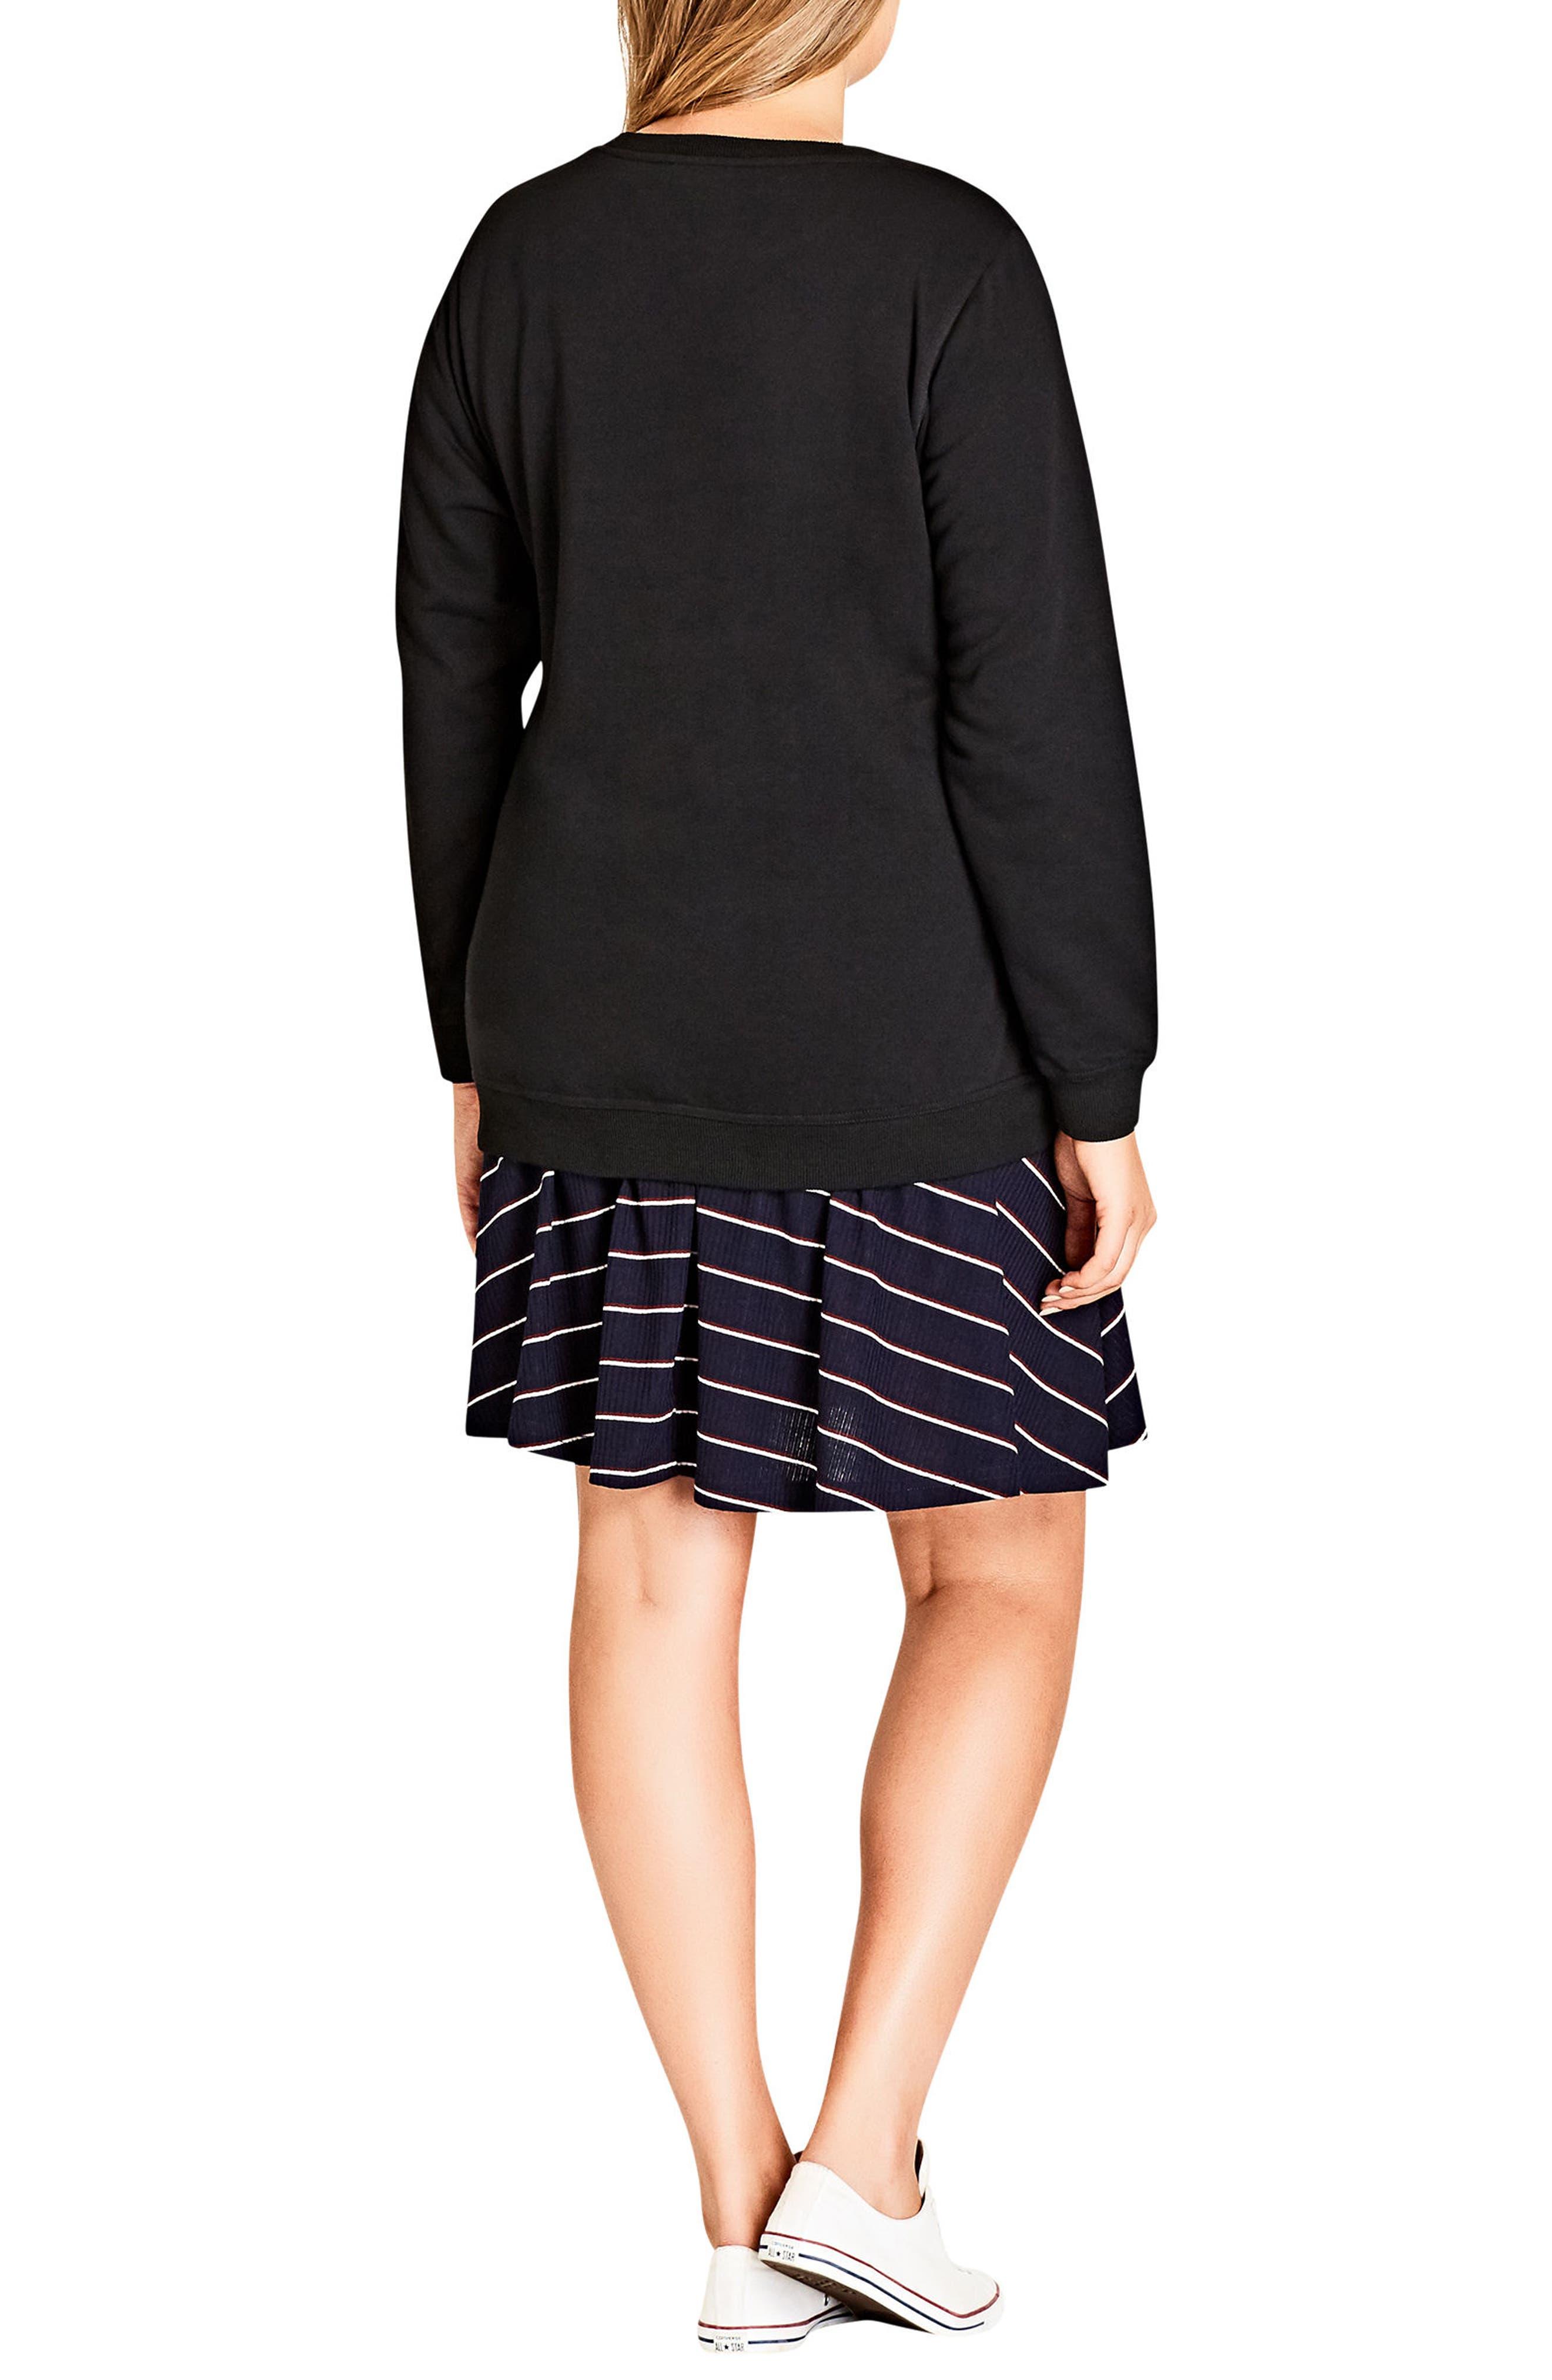 Alternate Image 2  - City Chic Top Slogan Sweatshirt (Plus Size)